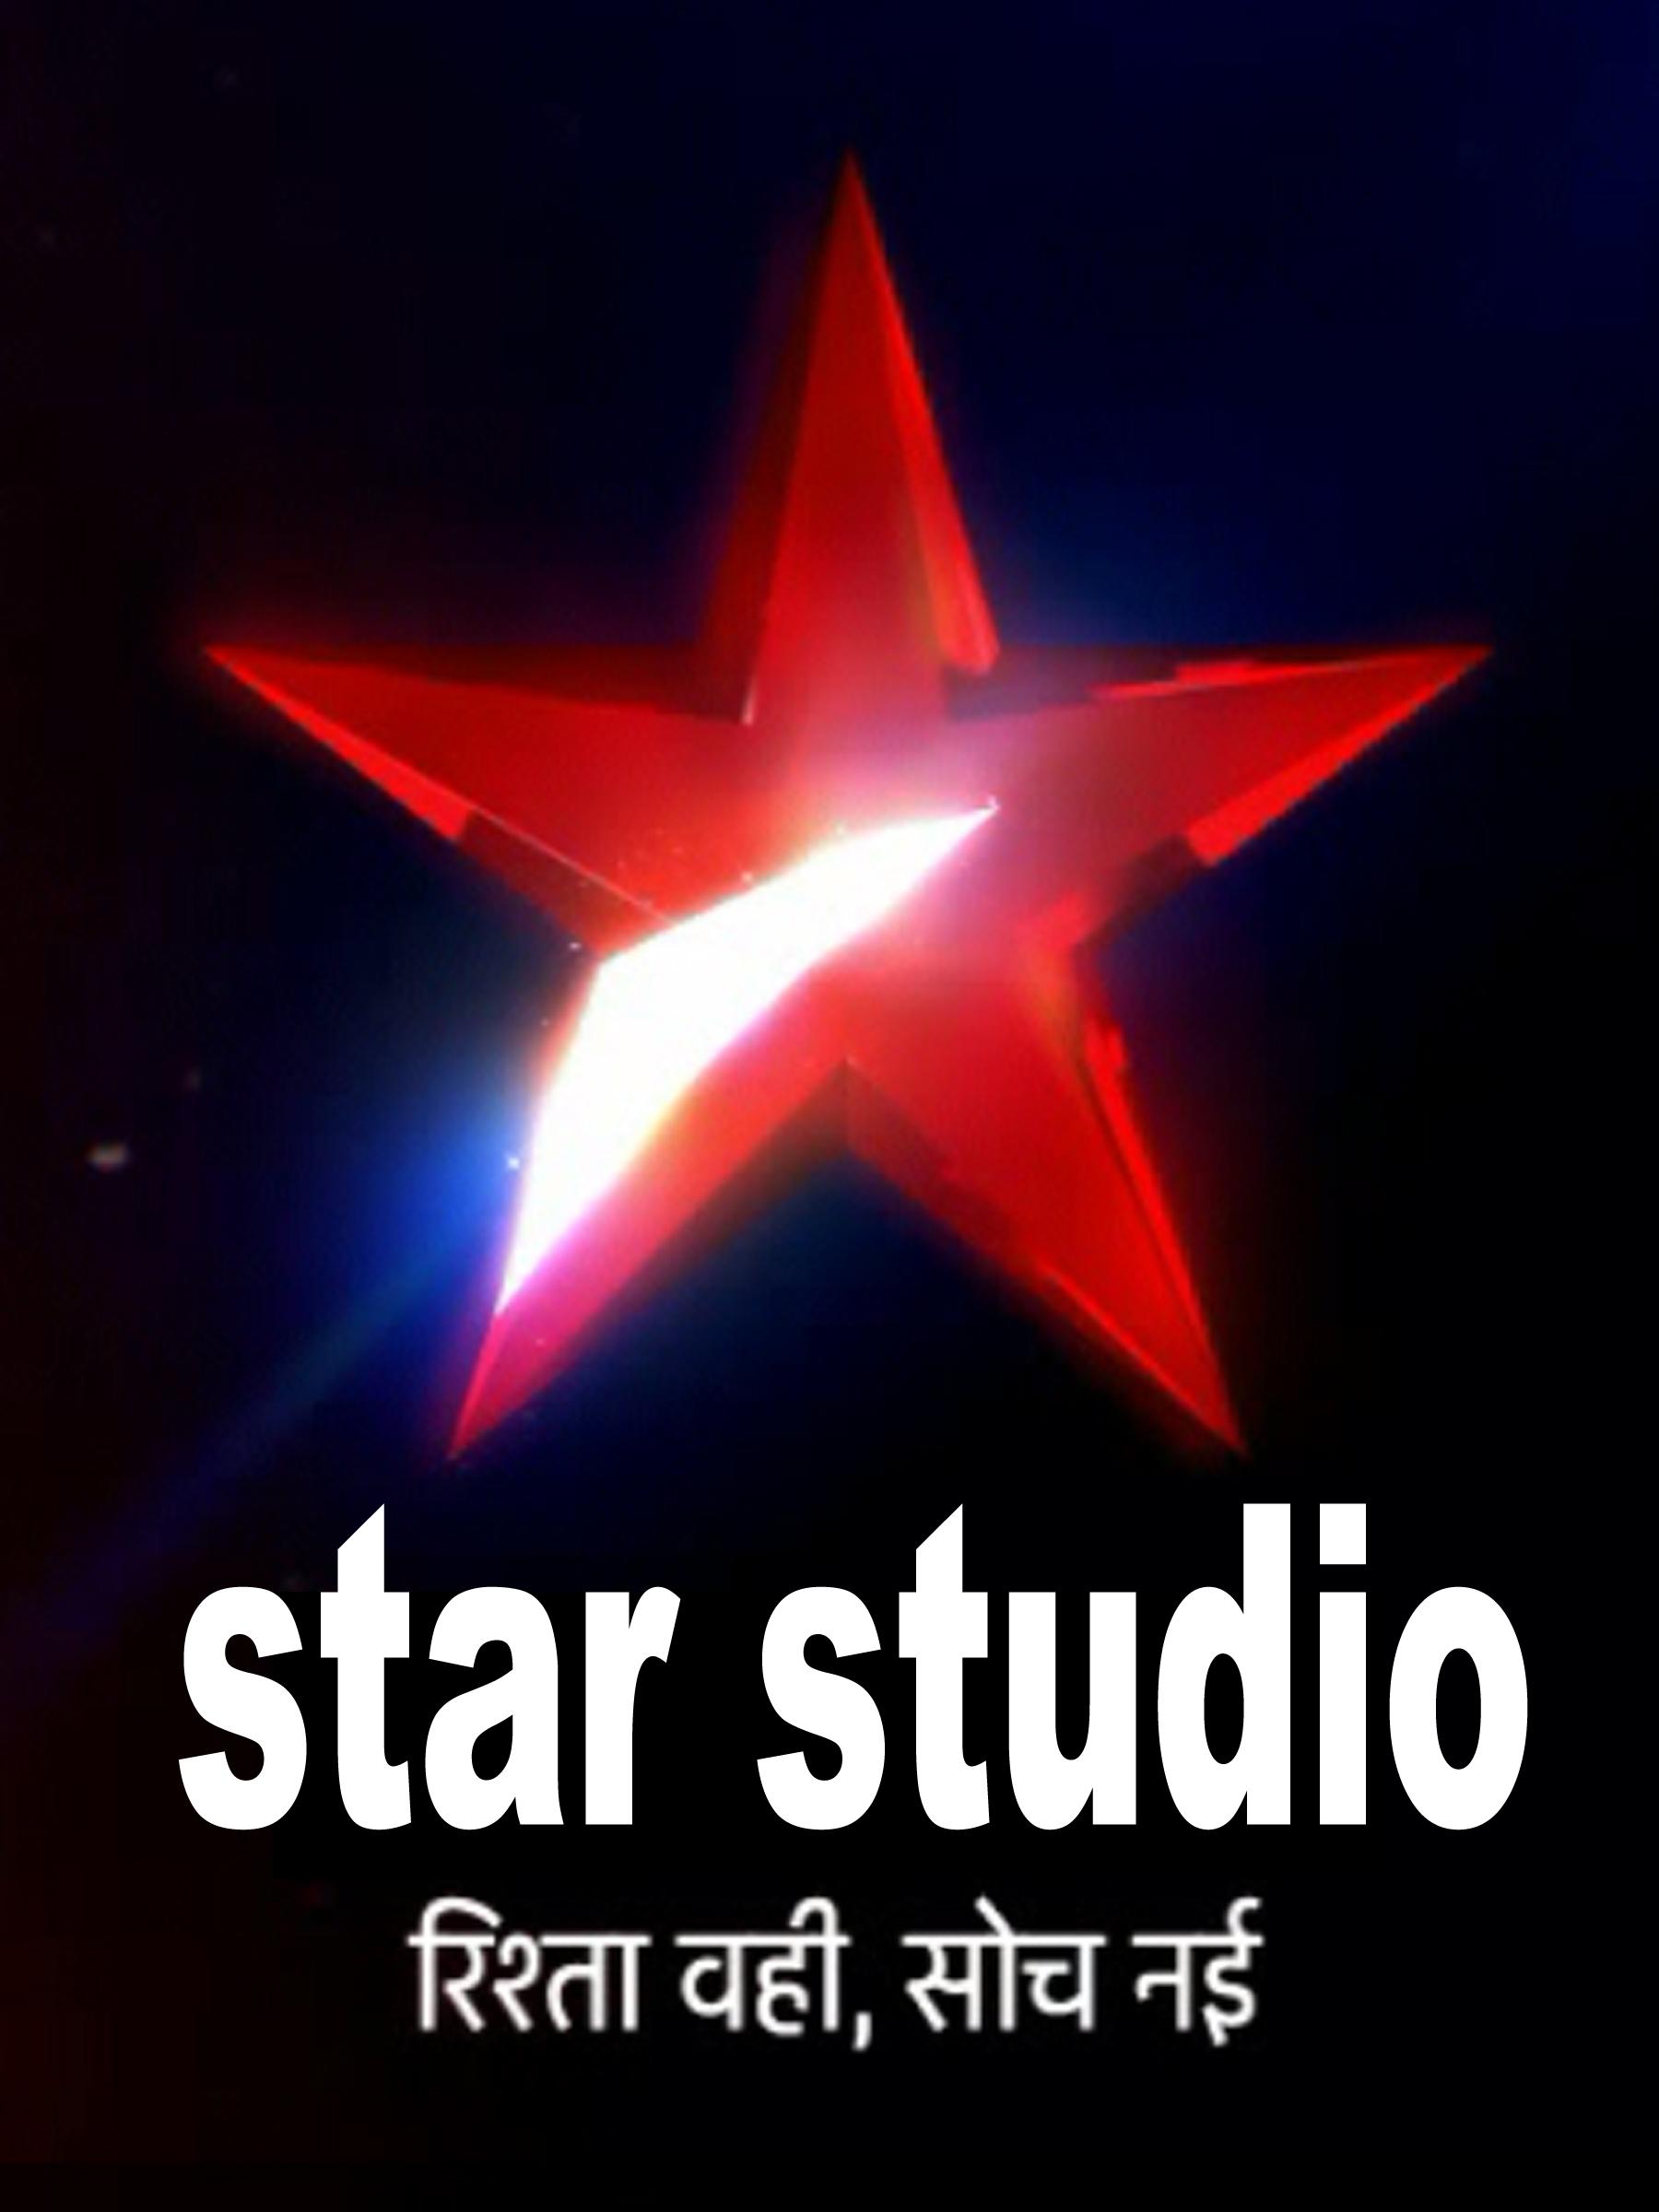 star studio obra sonebhadra